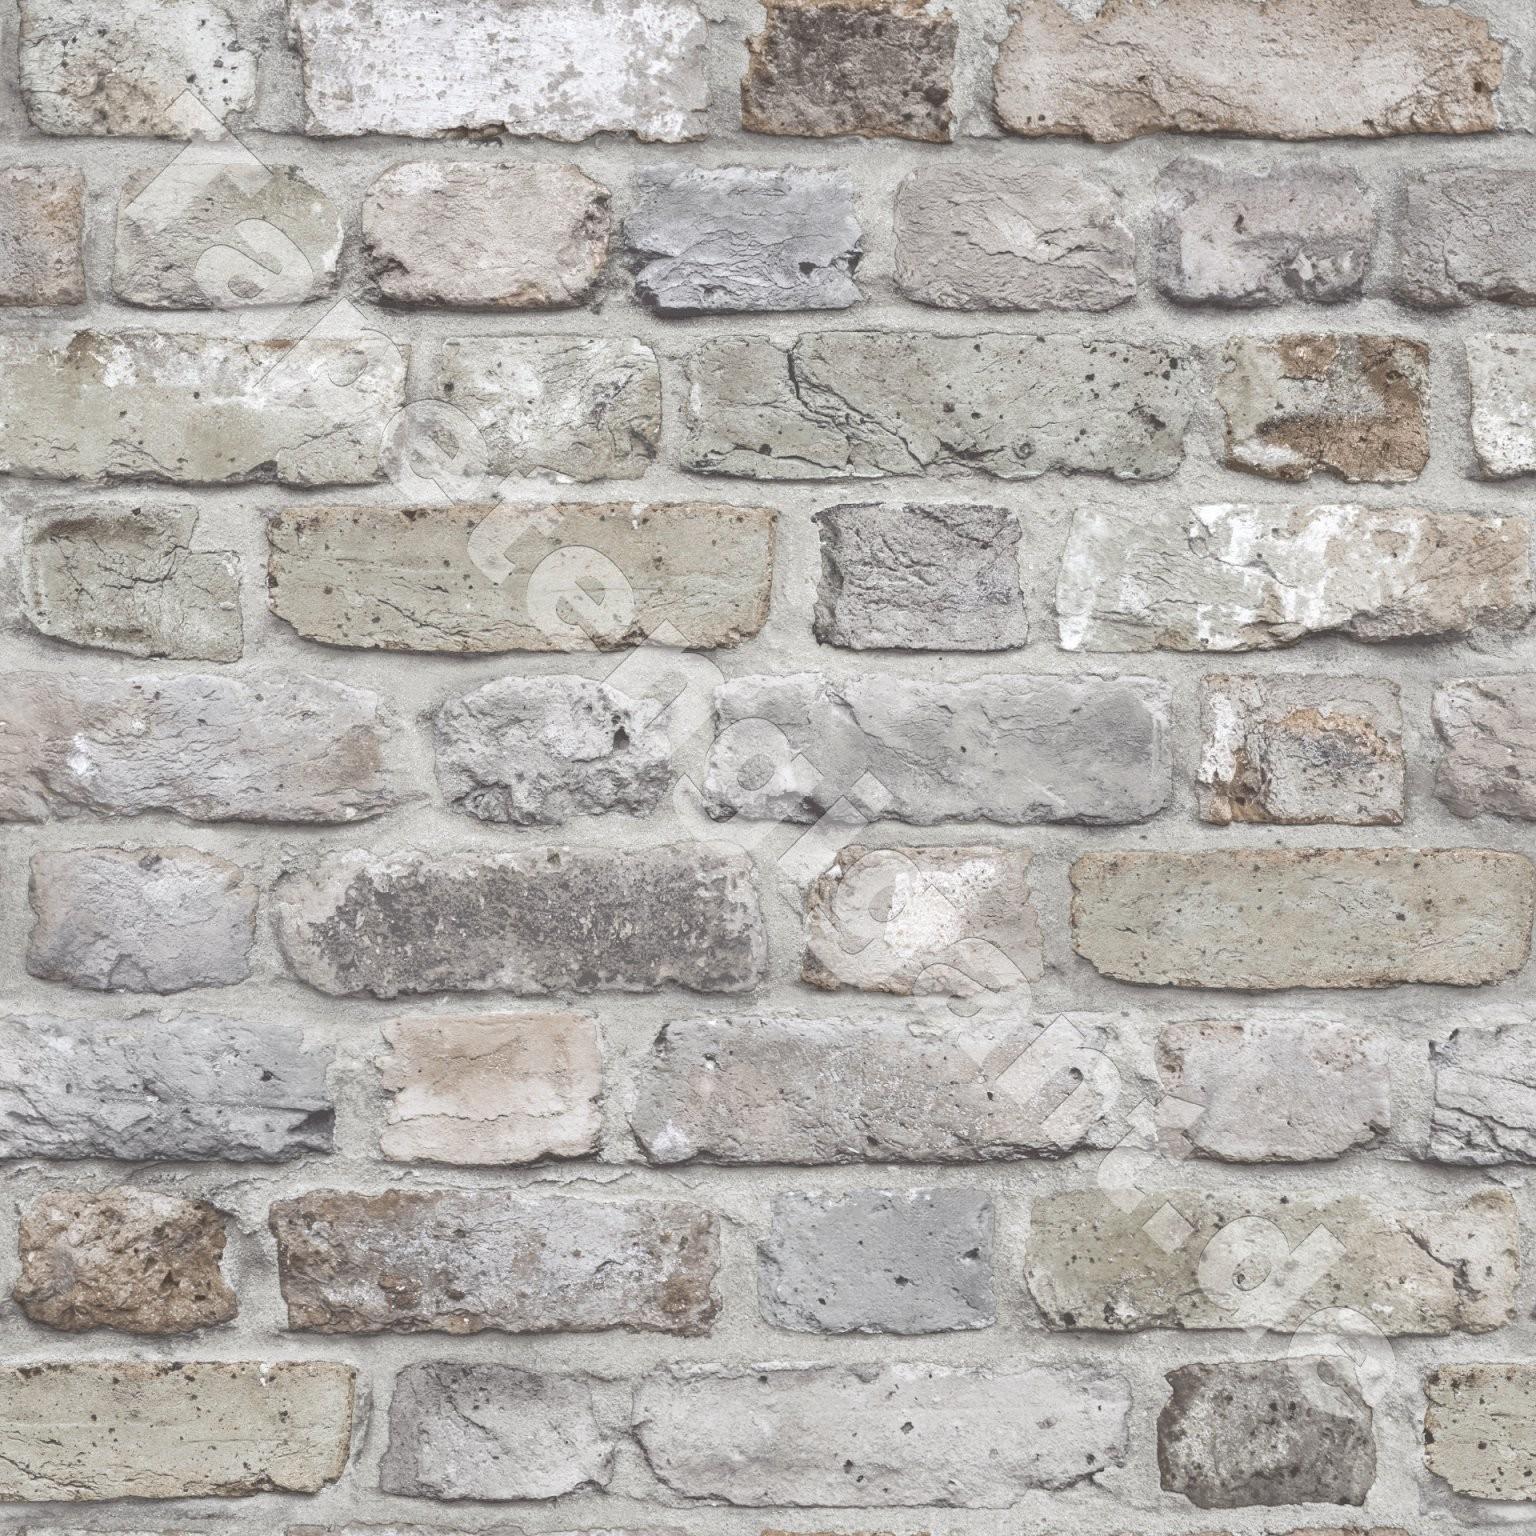 Rasch Factory Stein Optik Mauer Vlies Tapete Sand Beige Frisch Rasch von Rasch Factory Stein Optik Mauer Vlies Tapete Bild